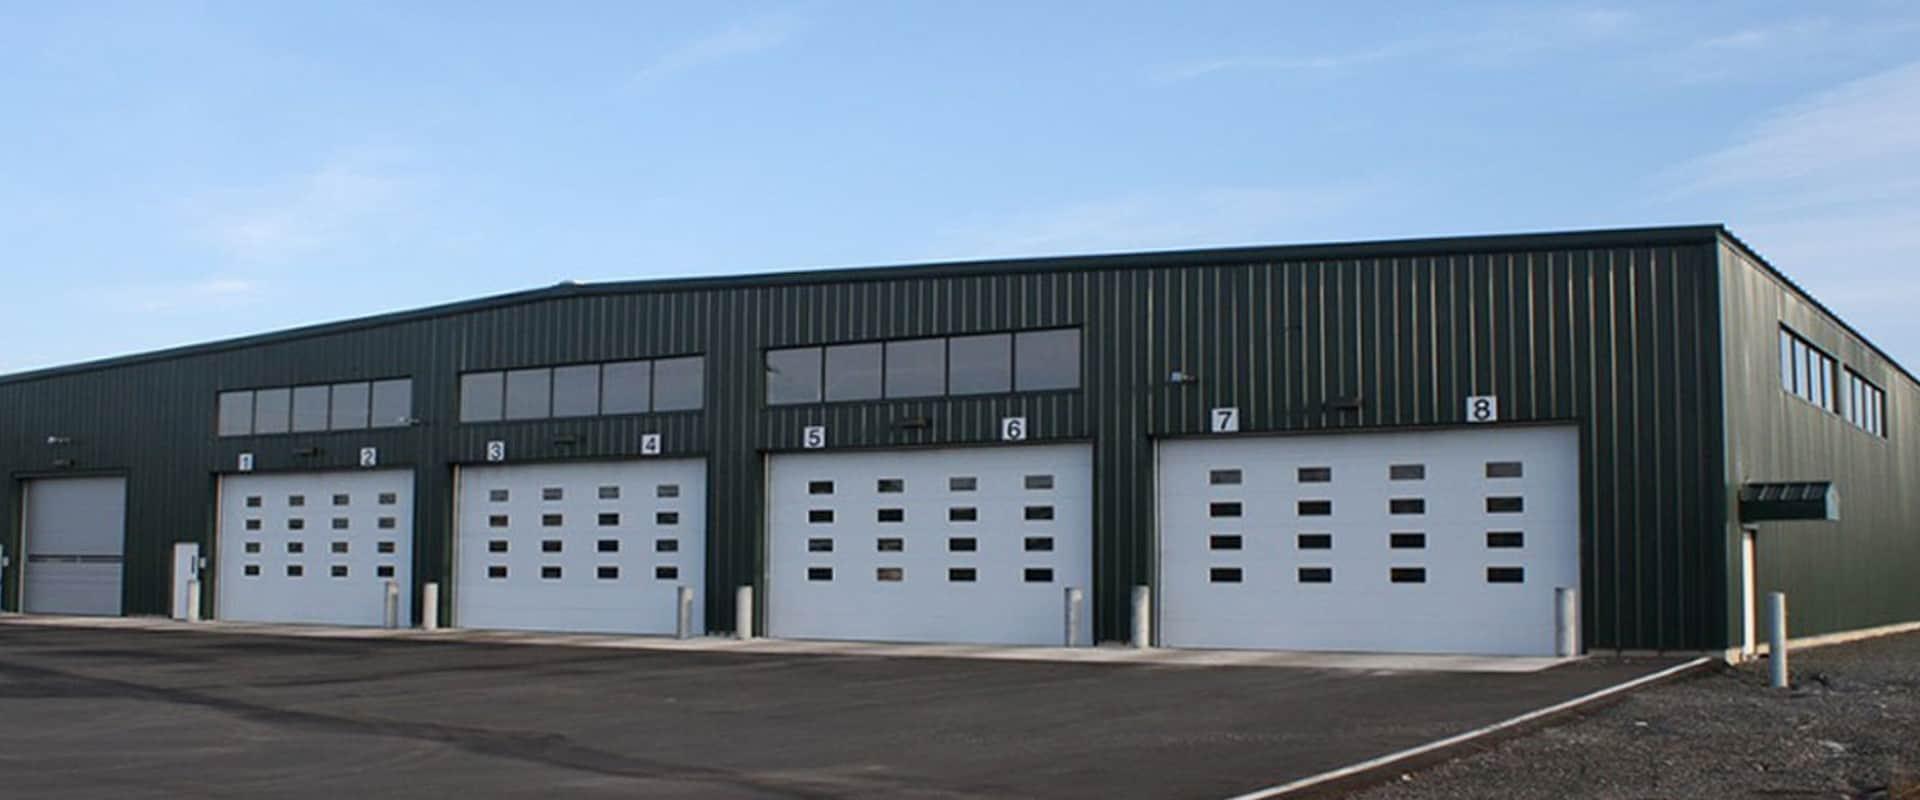 Kodiak Warehouse Buildings